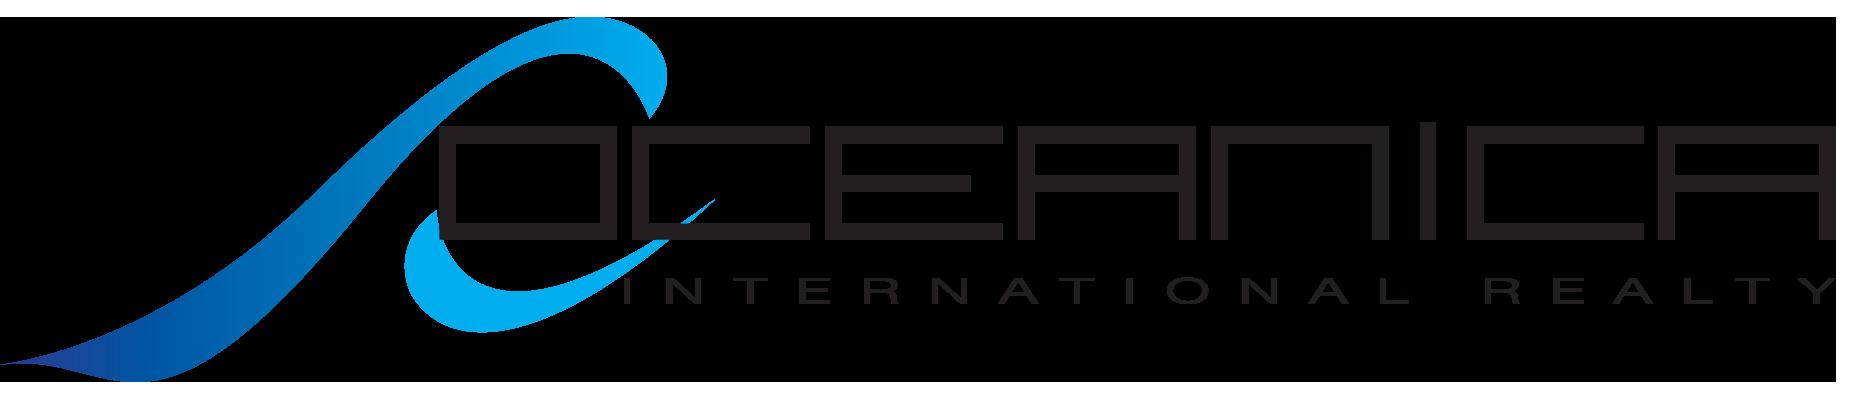 Oceanica Realty LLC